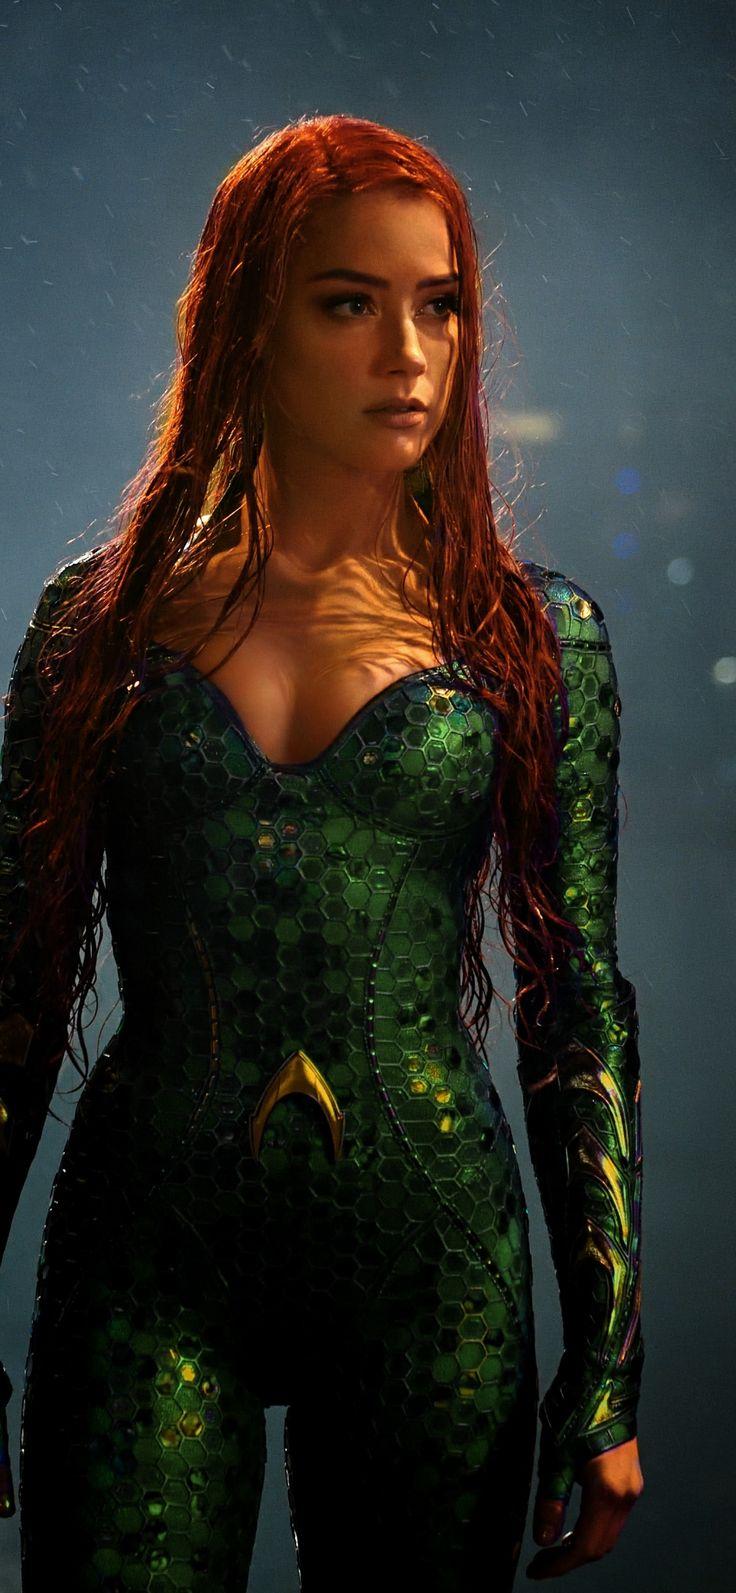 Movie, Aquaman, Amber Heard, Mera, 1125X2436 Wallpaper -4868